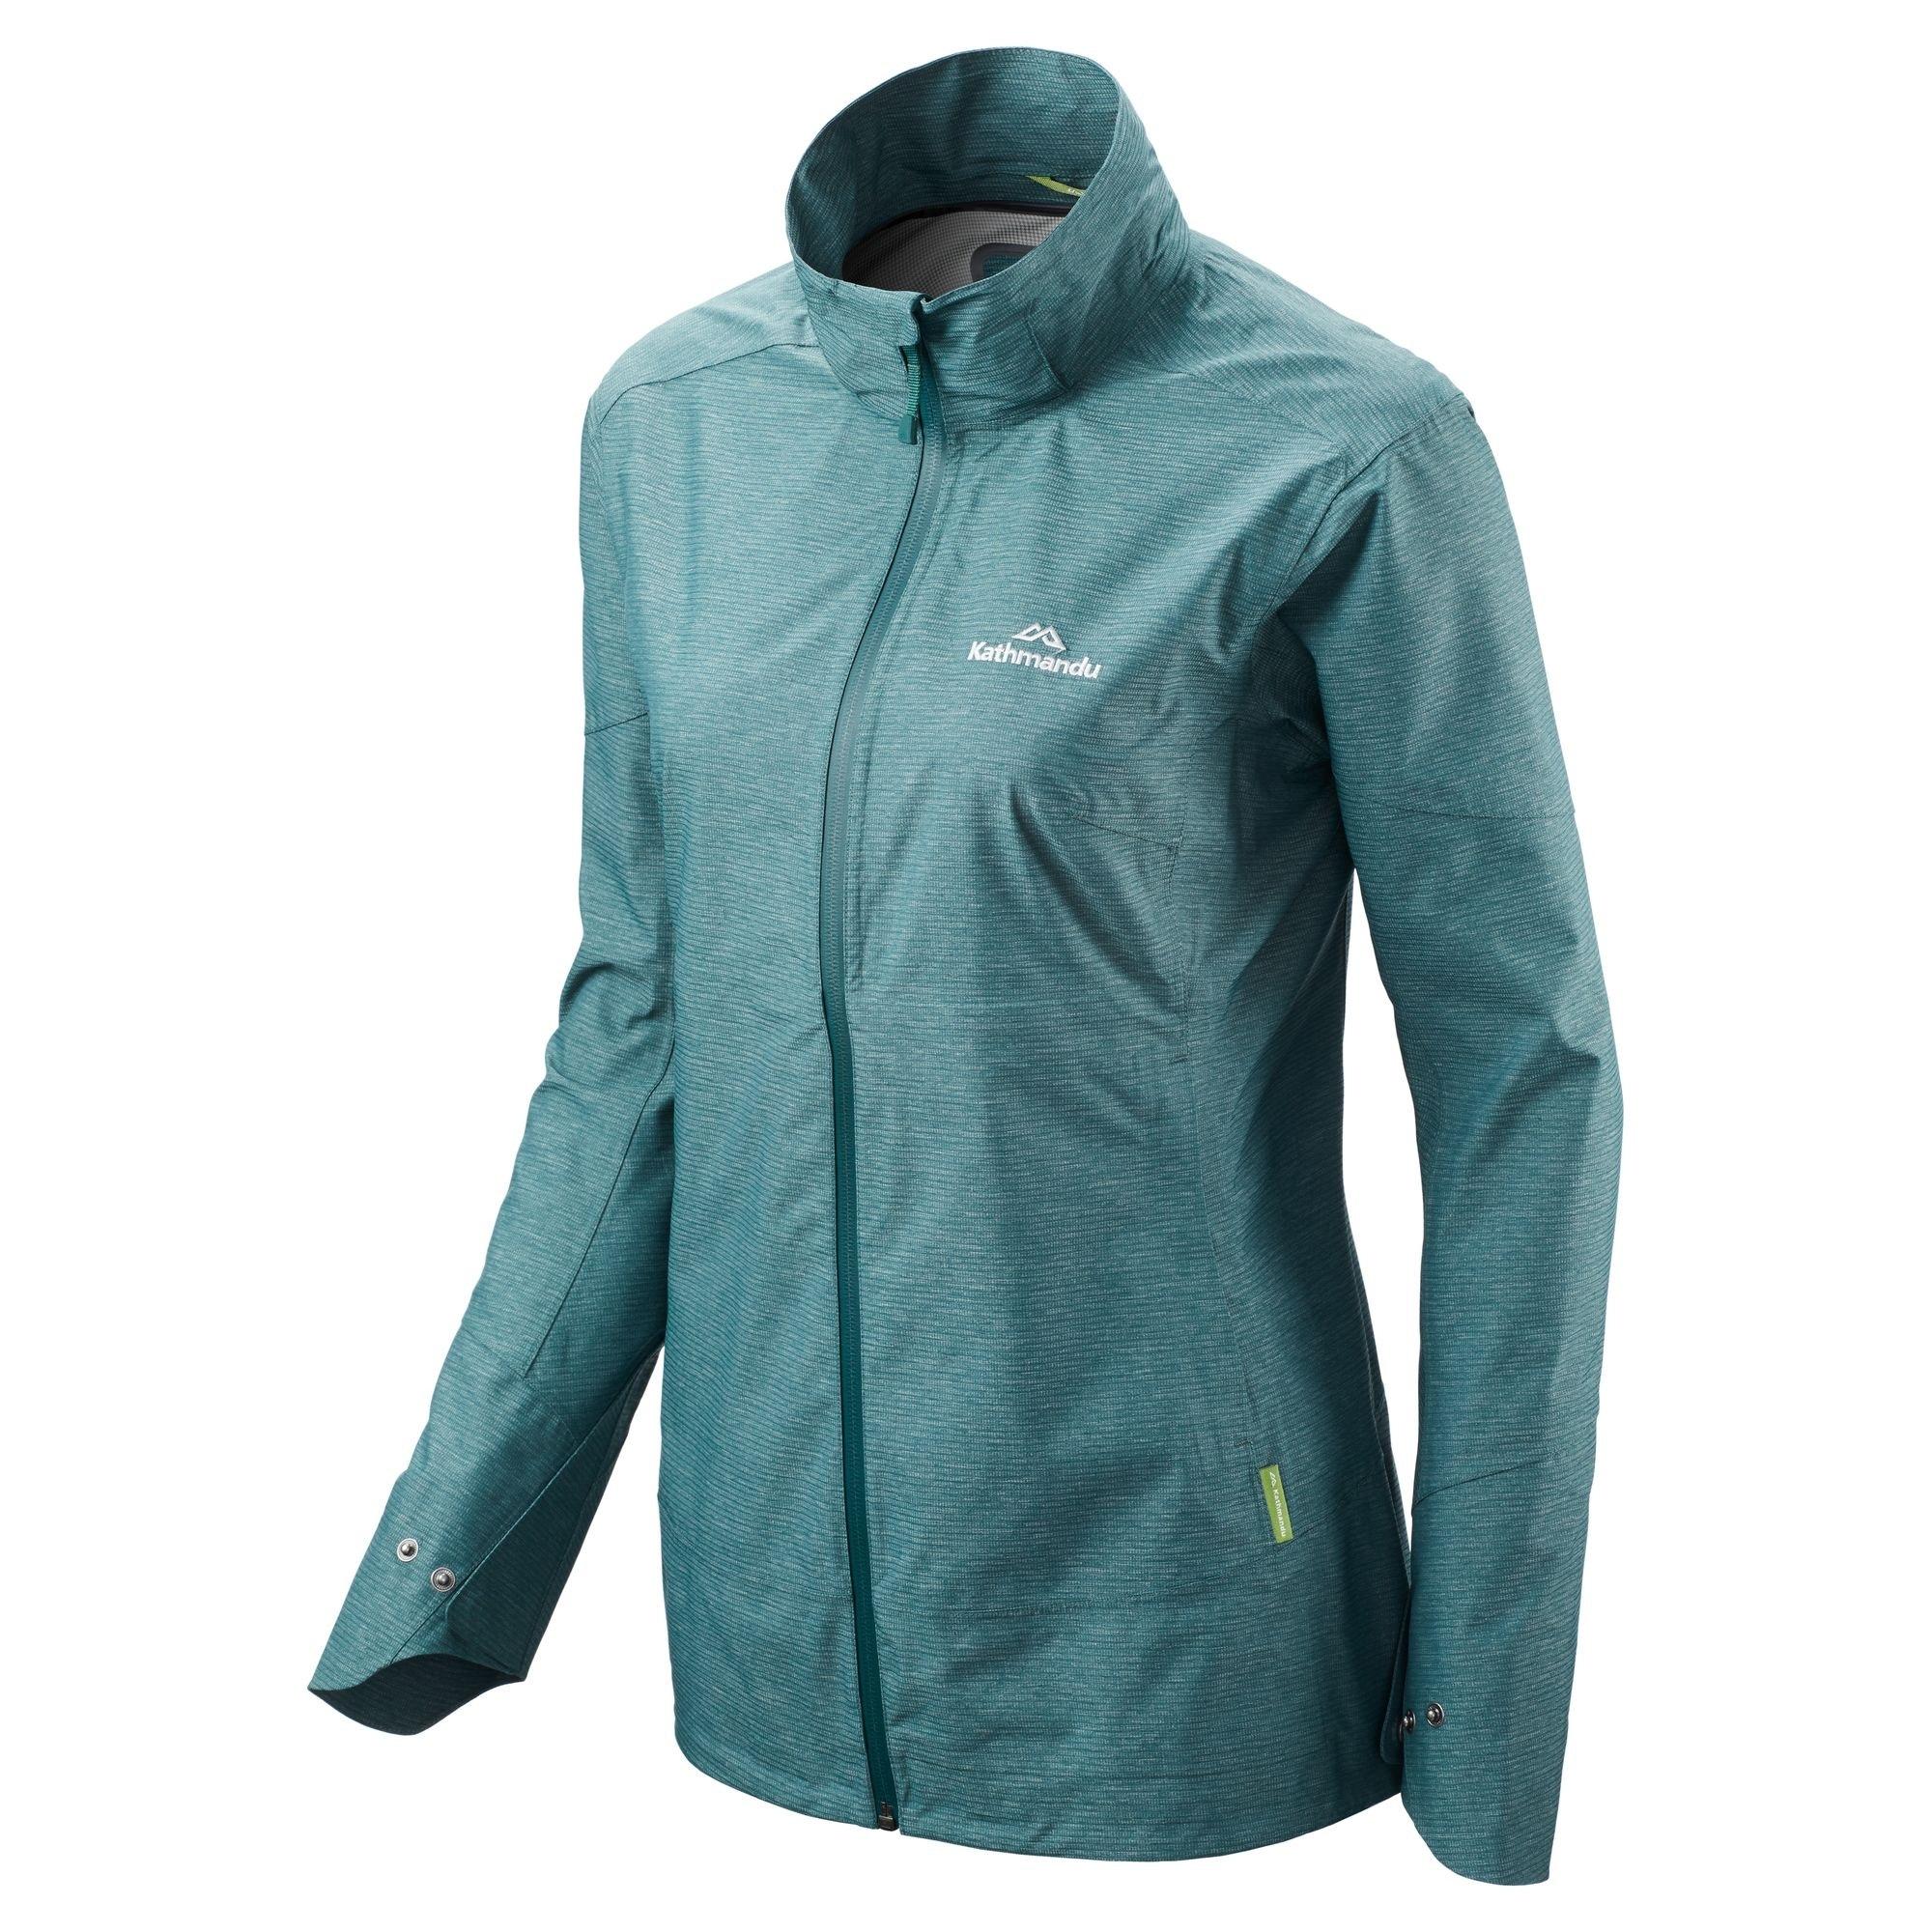 NEW-Kathmandu-Lawrence-Women-039-s-ngx-Windproof-Waterproof-Outdoor-Rain-Jacket-v2 thumbnail 15